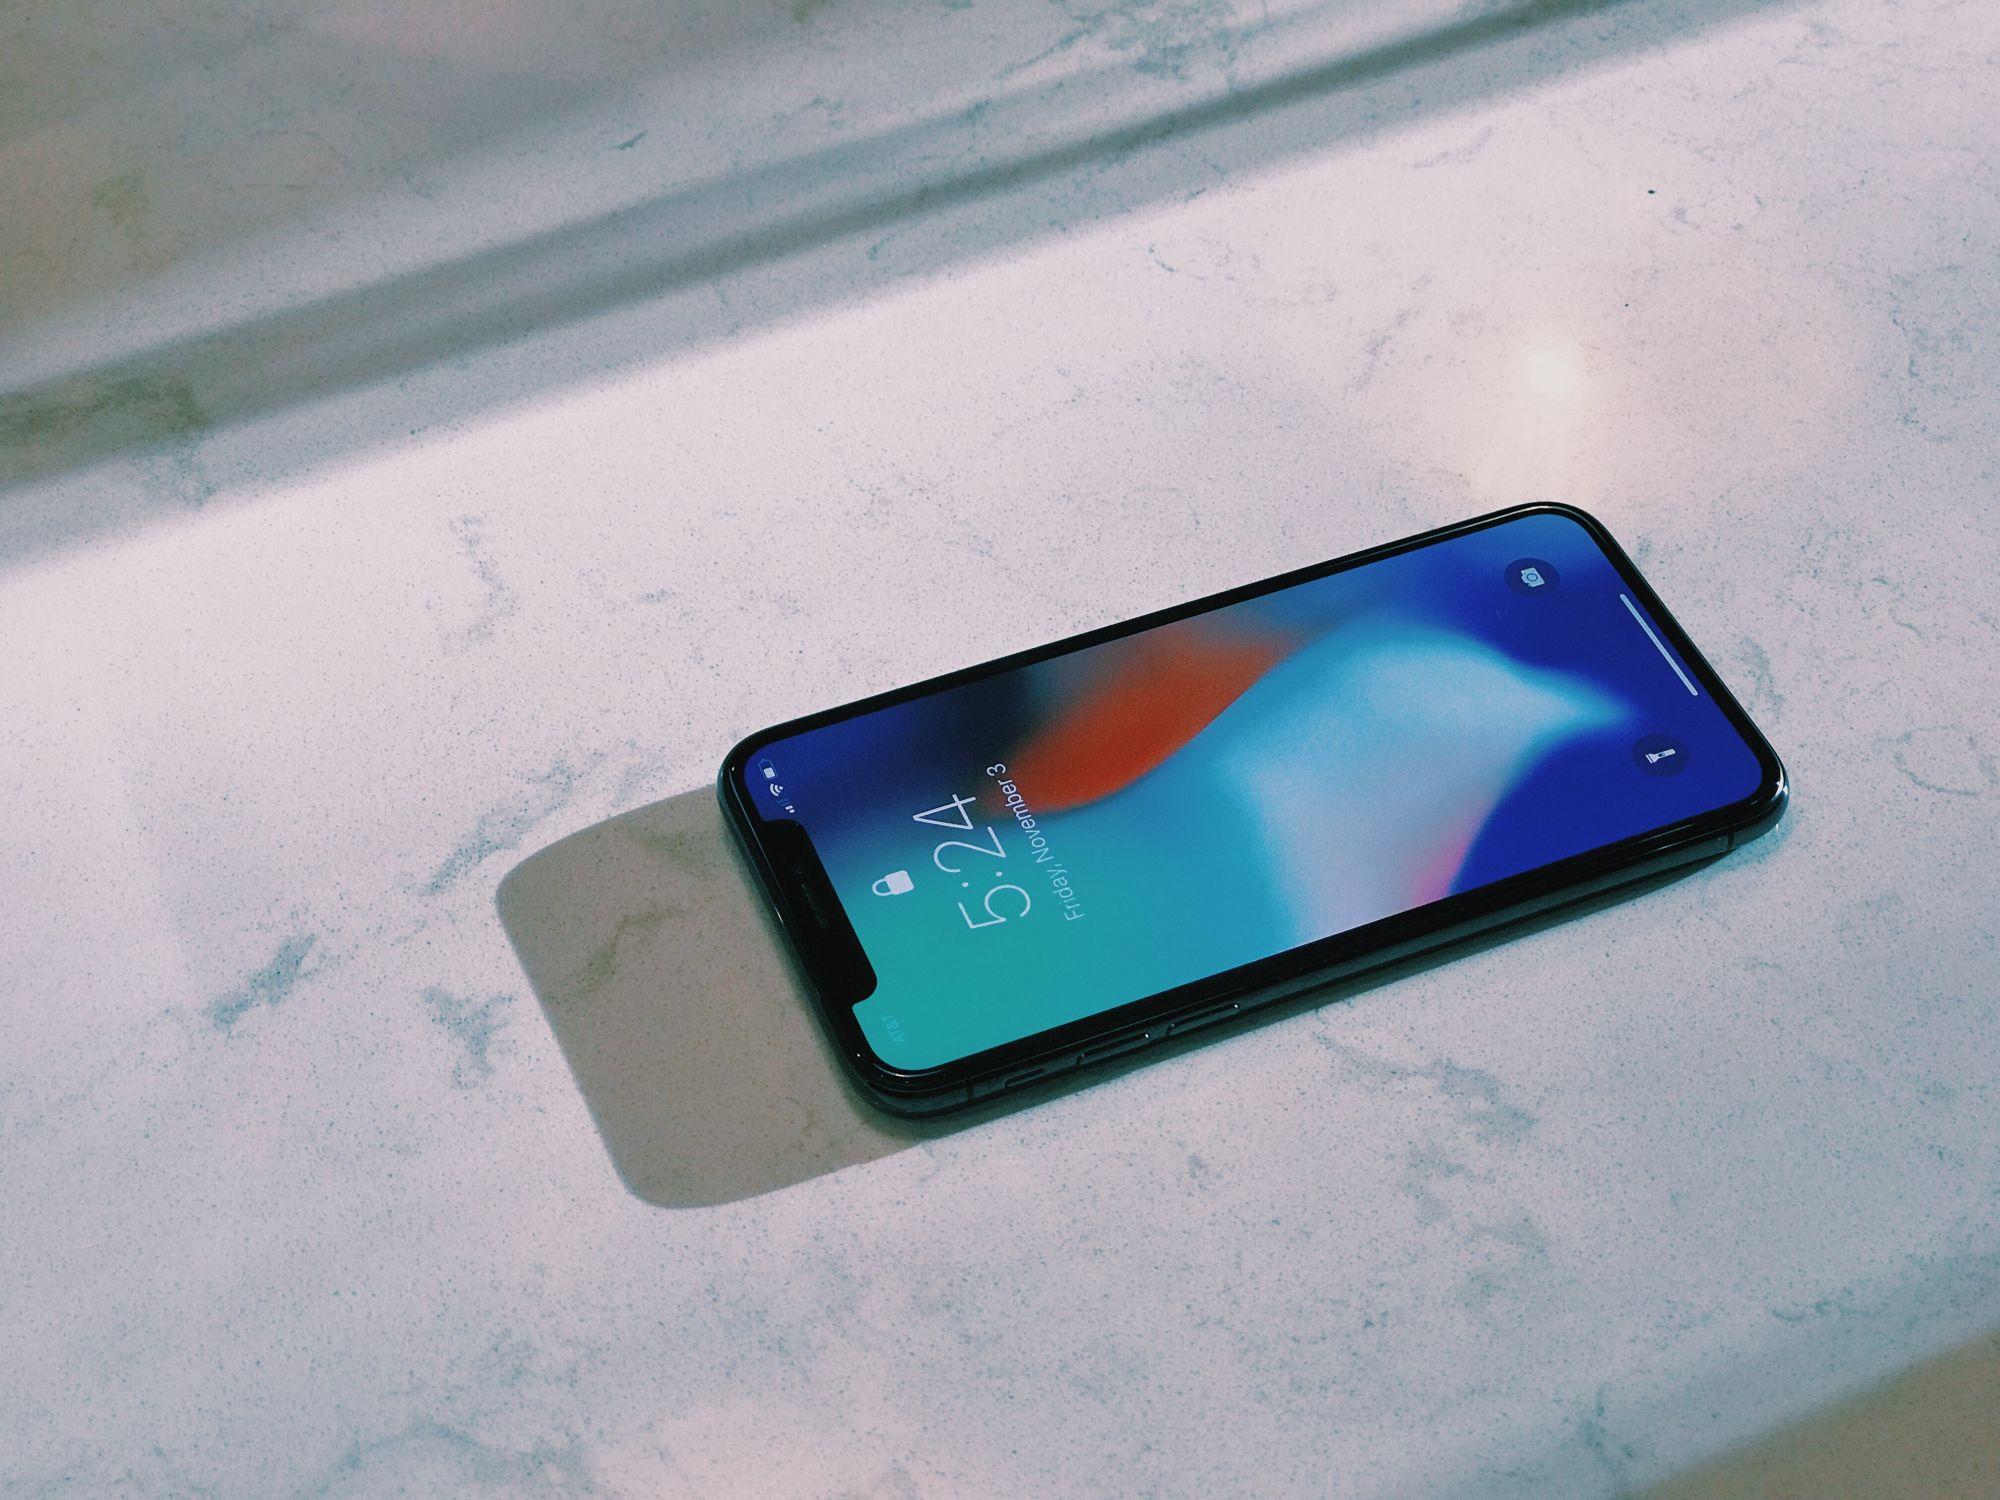 Apple iPhone iBoot